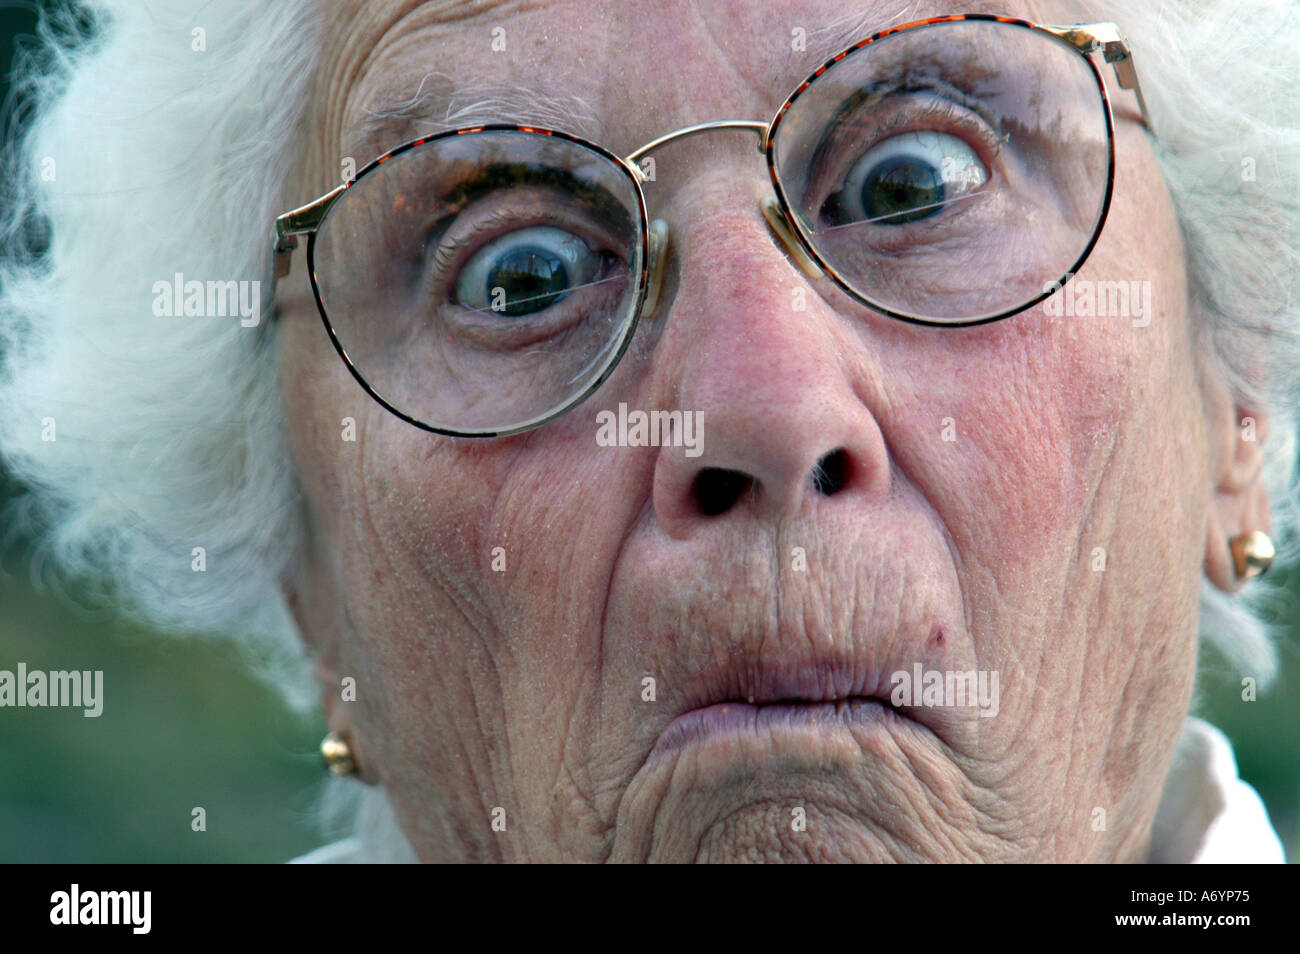 Femme Agee Faire Drole De Visage Photo Stock Alamy